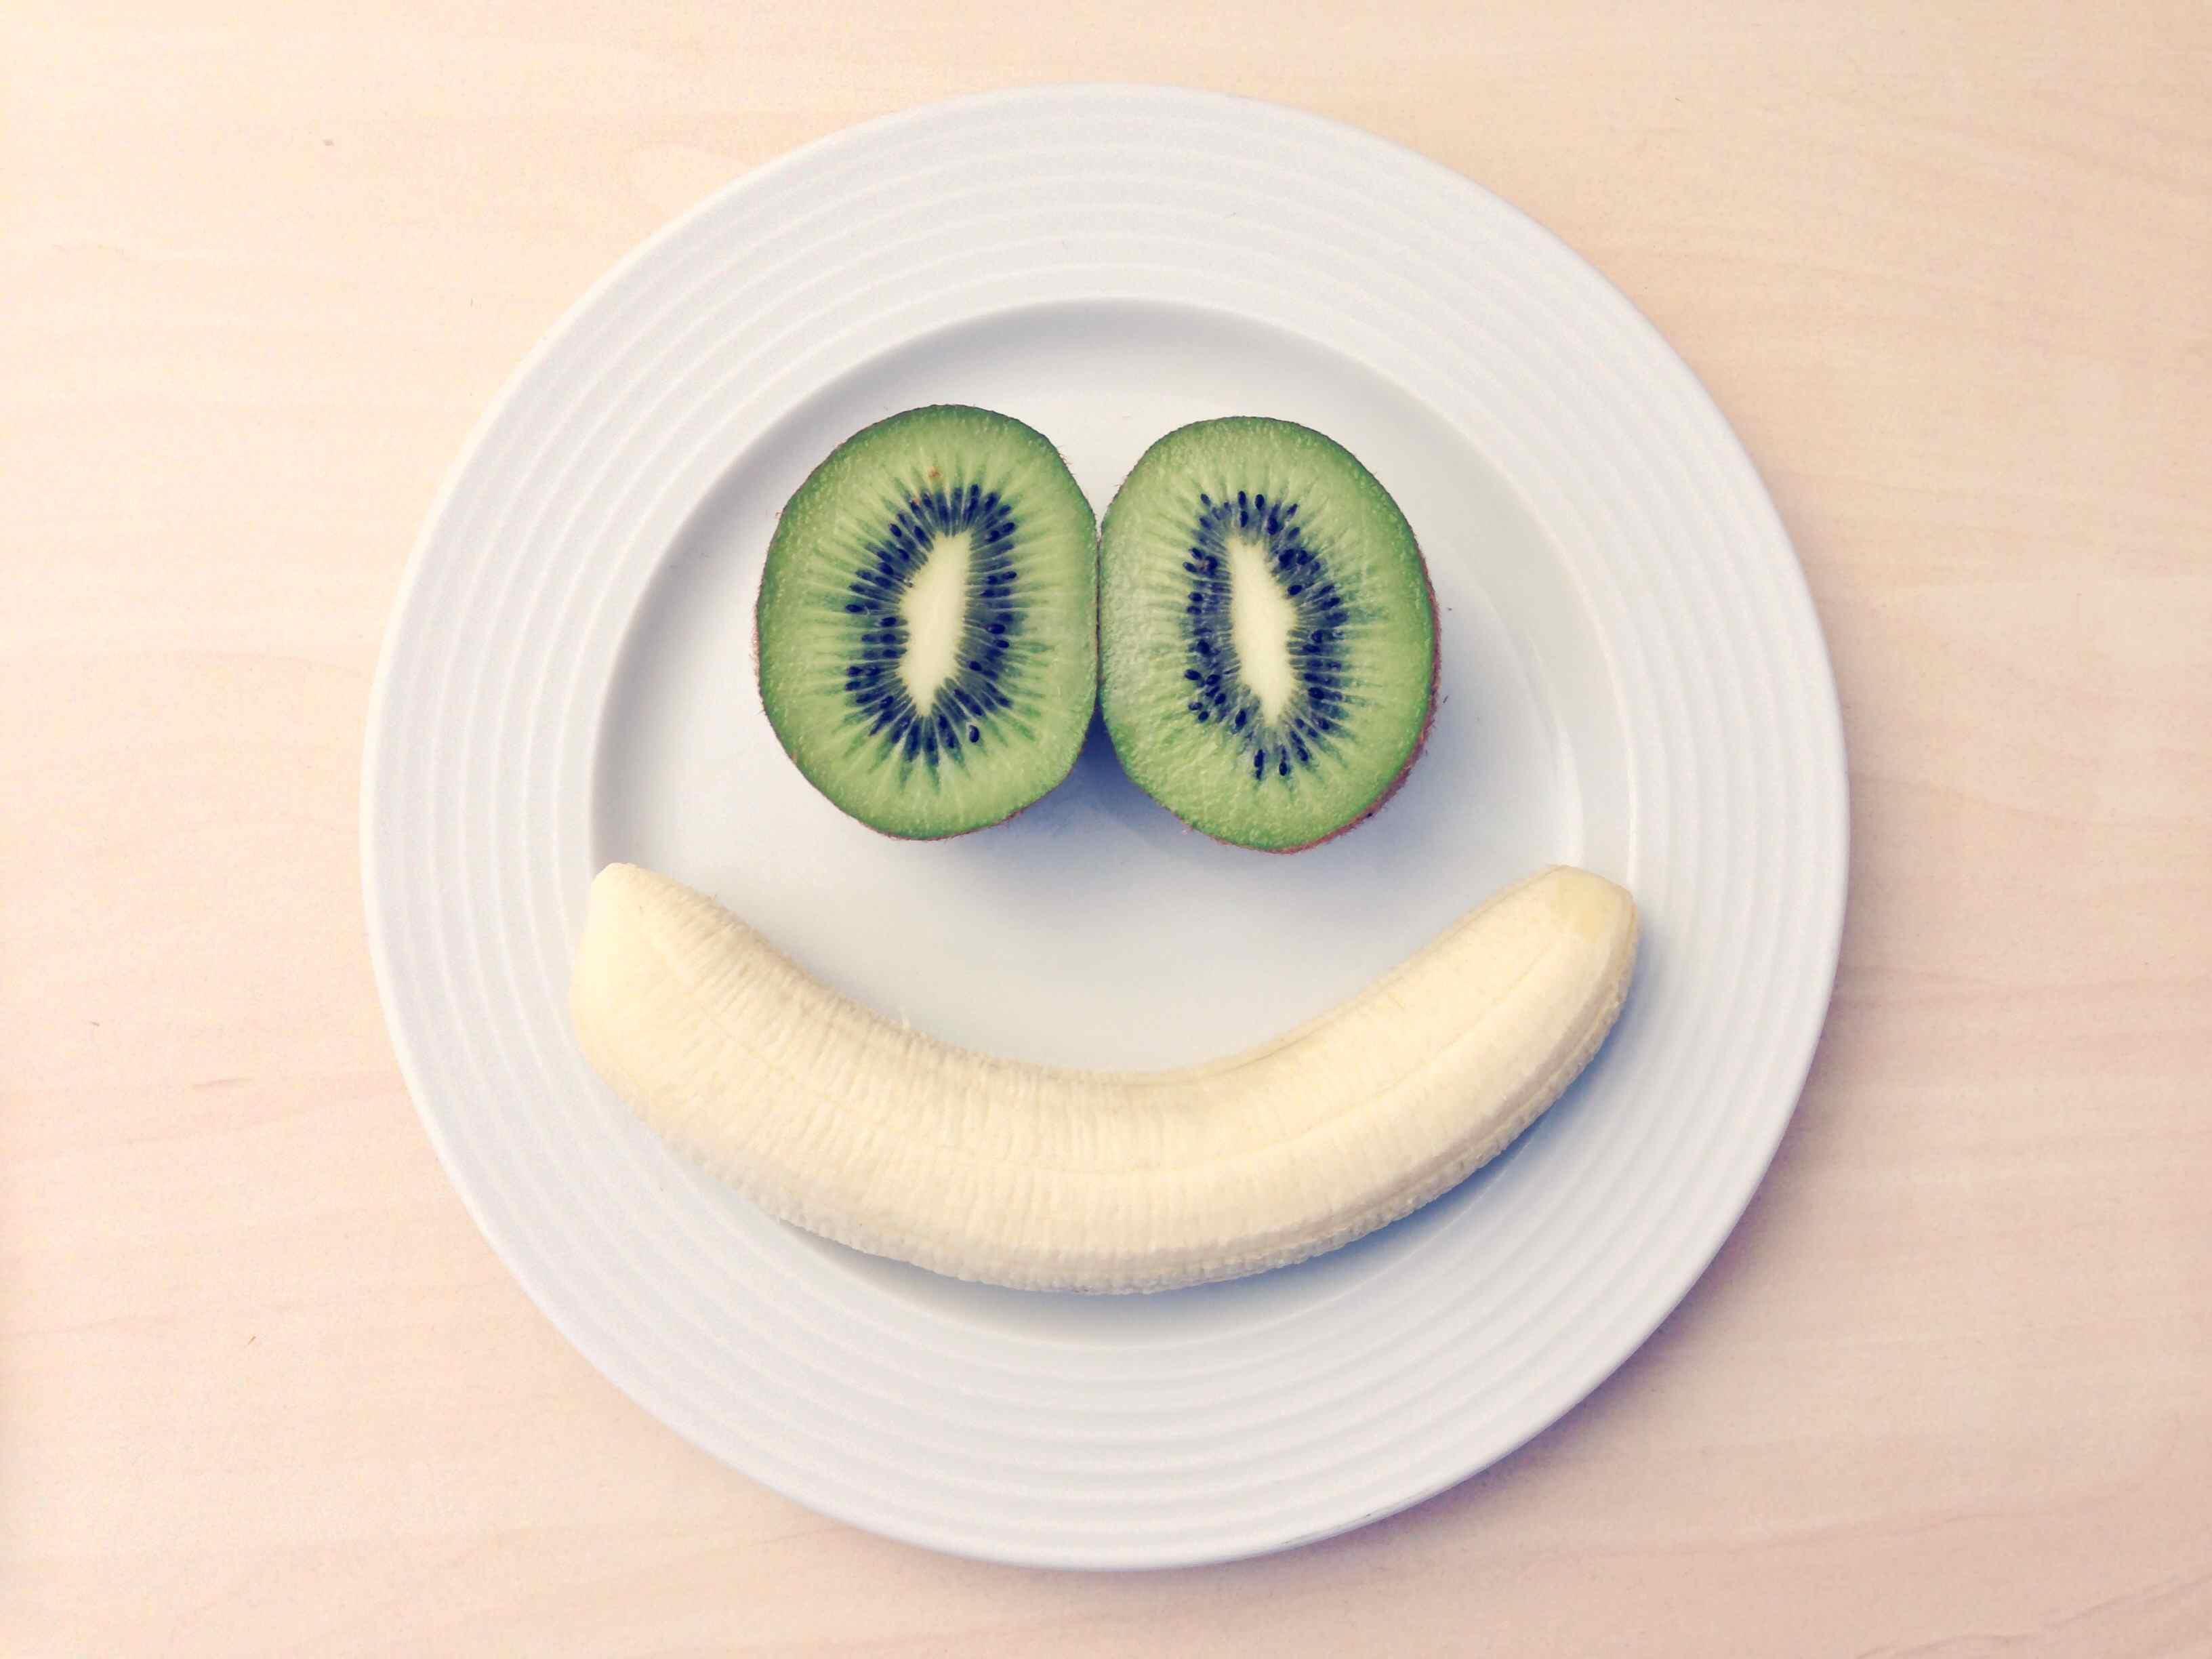 smiley face made with kiwi and banana